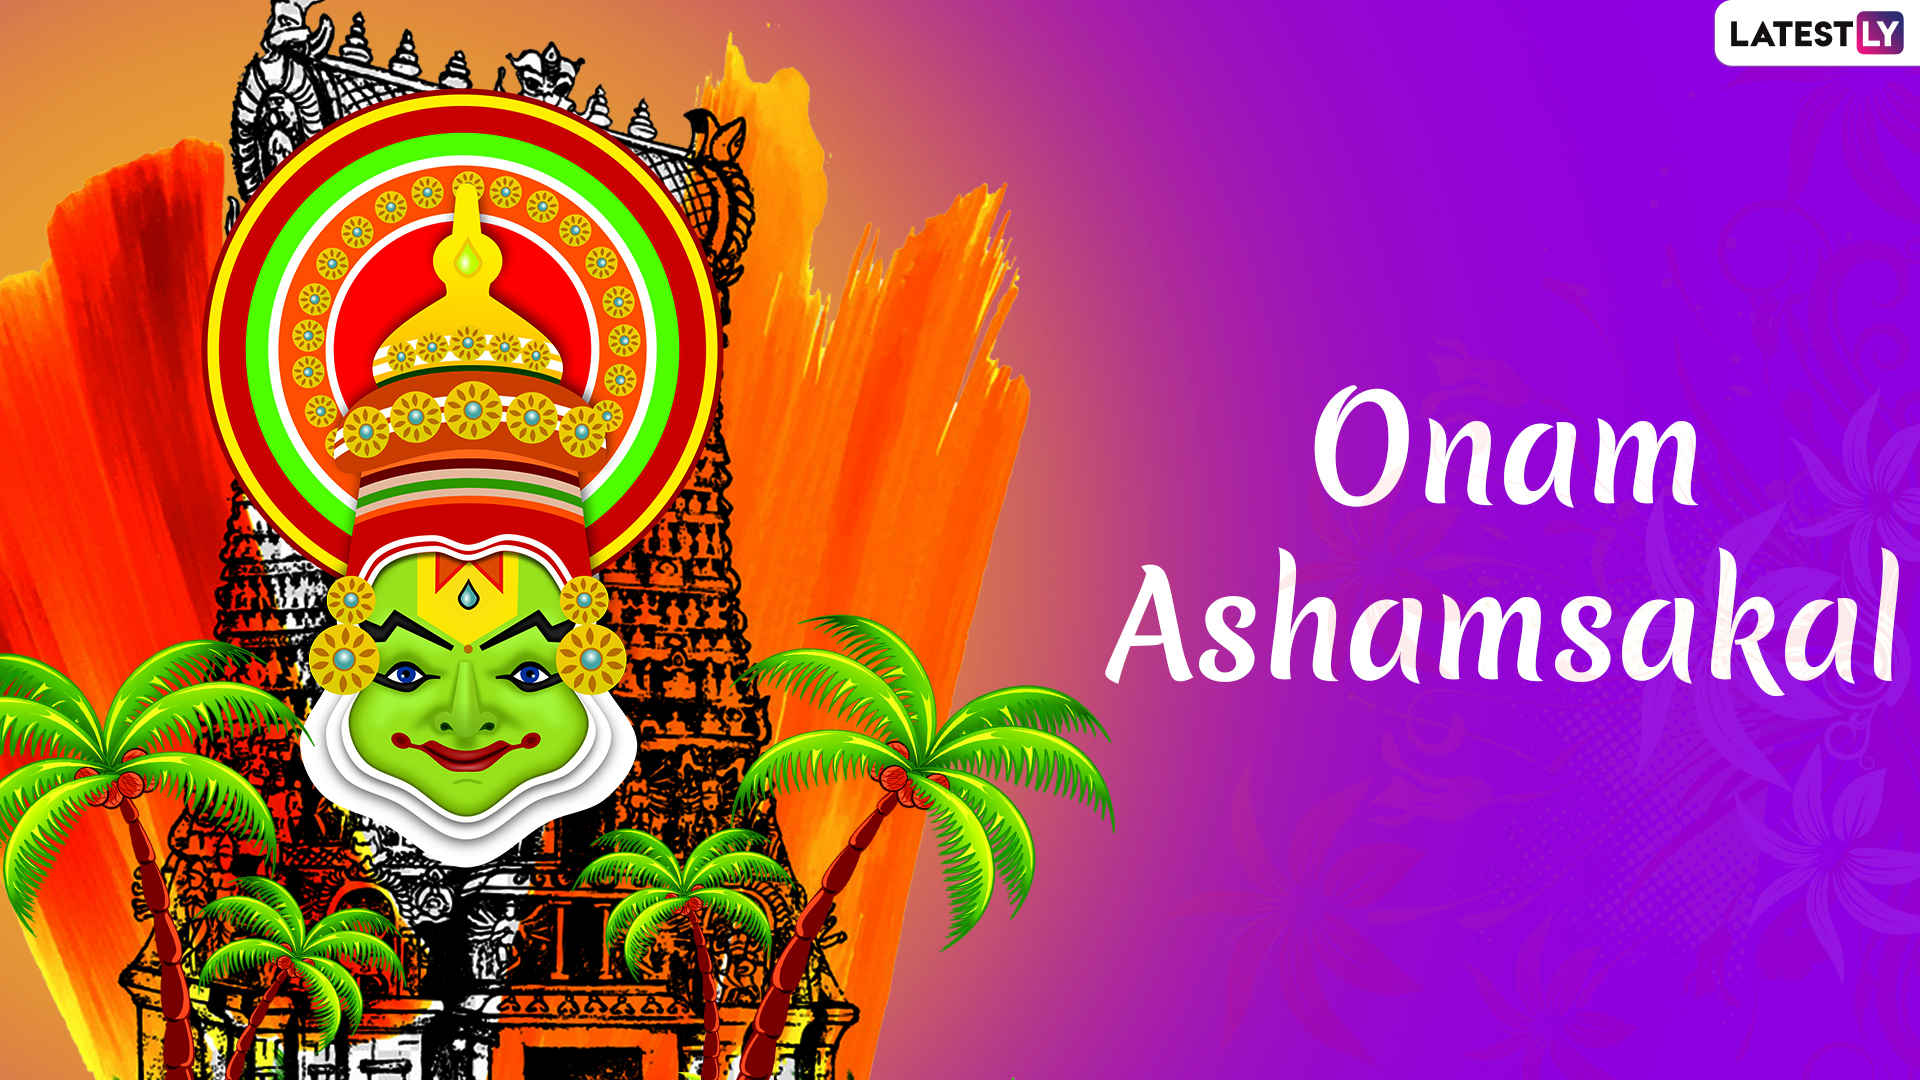 Onam Ashamsakal Images & HD Wallpapers for Free Download